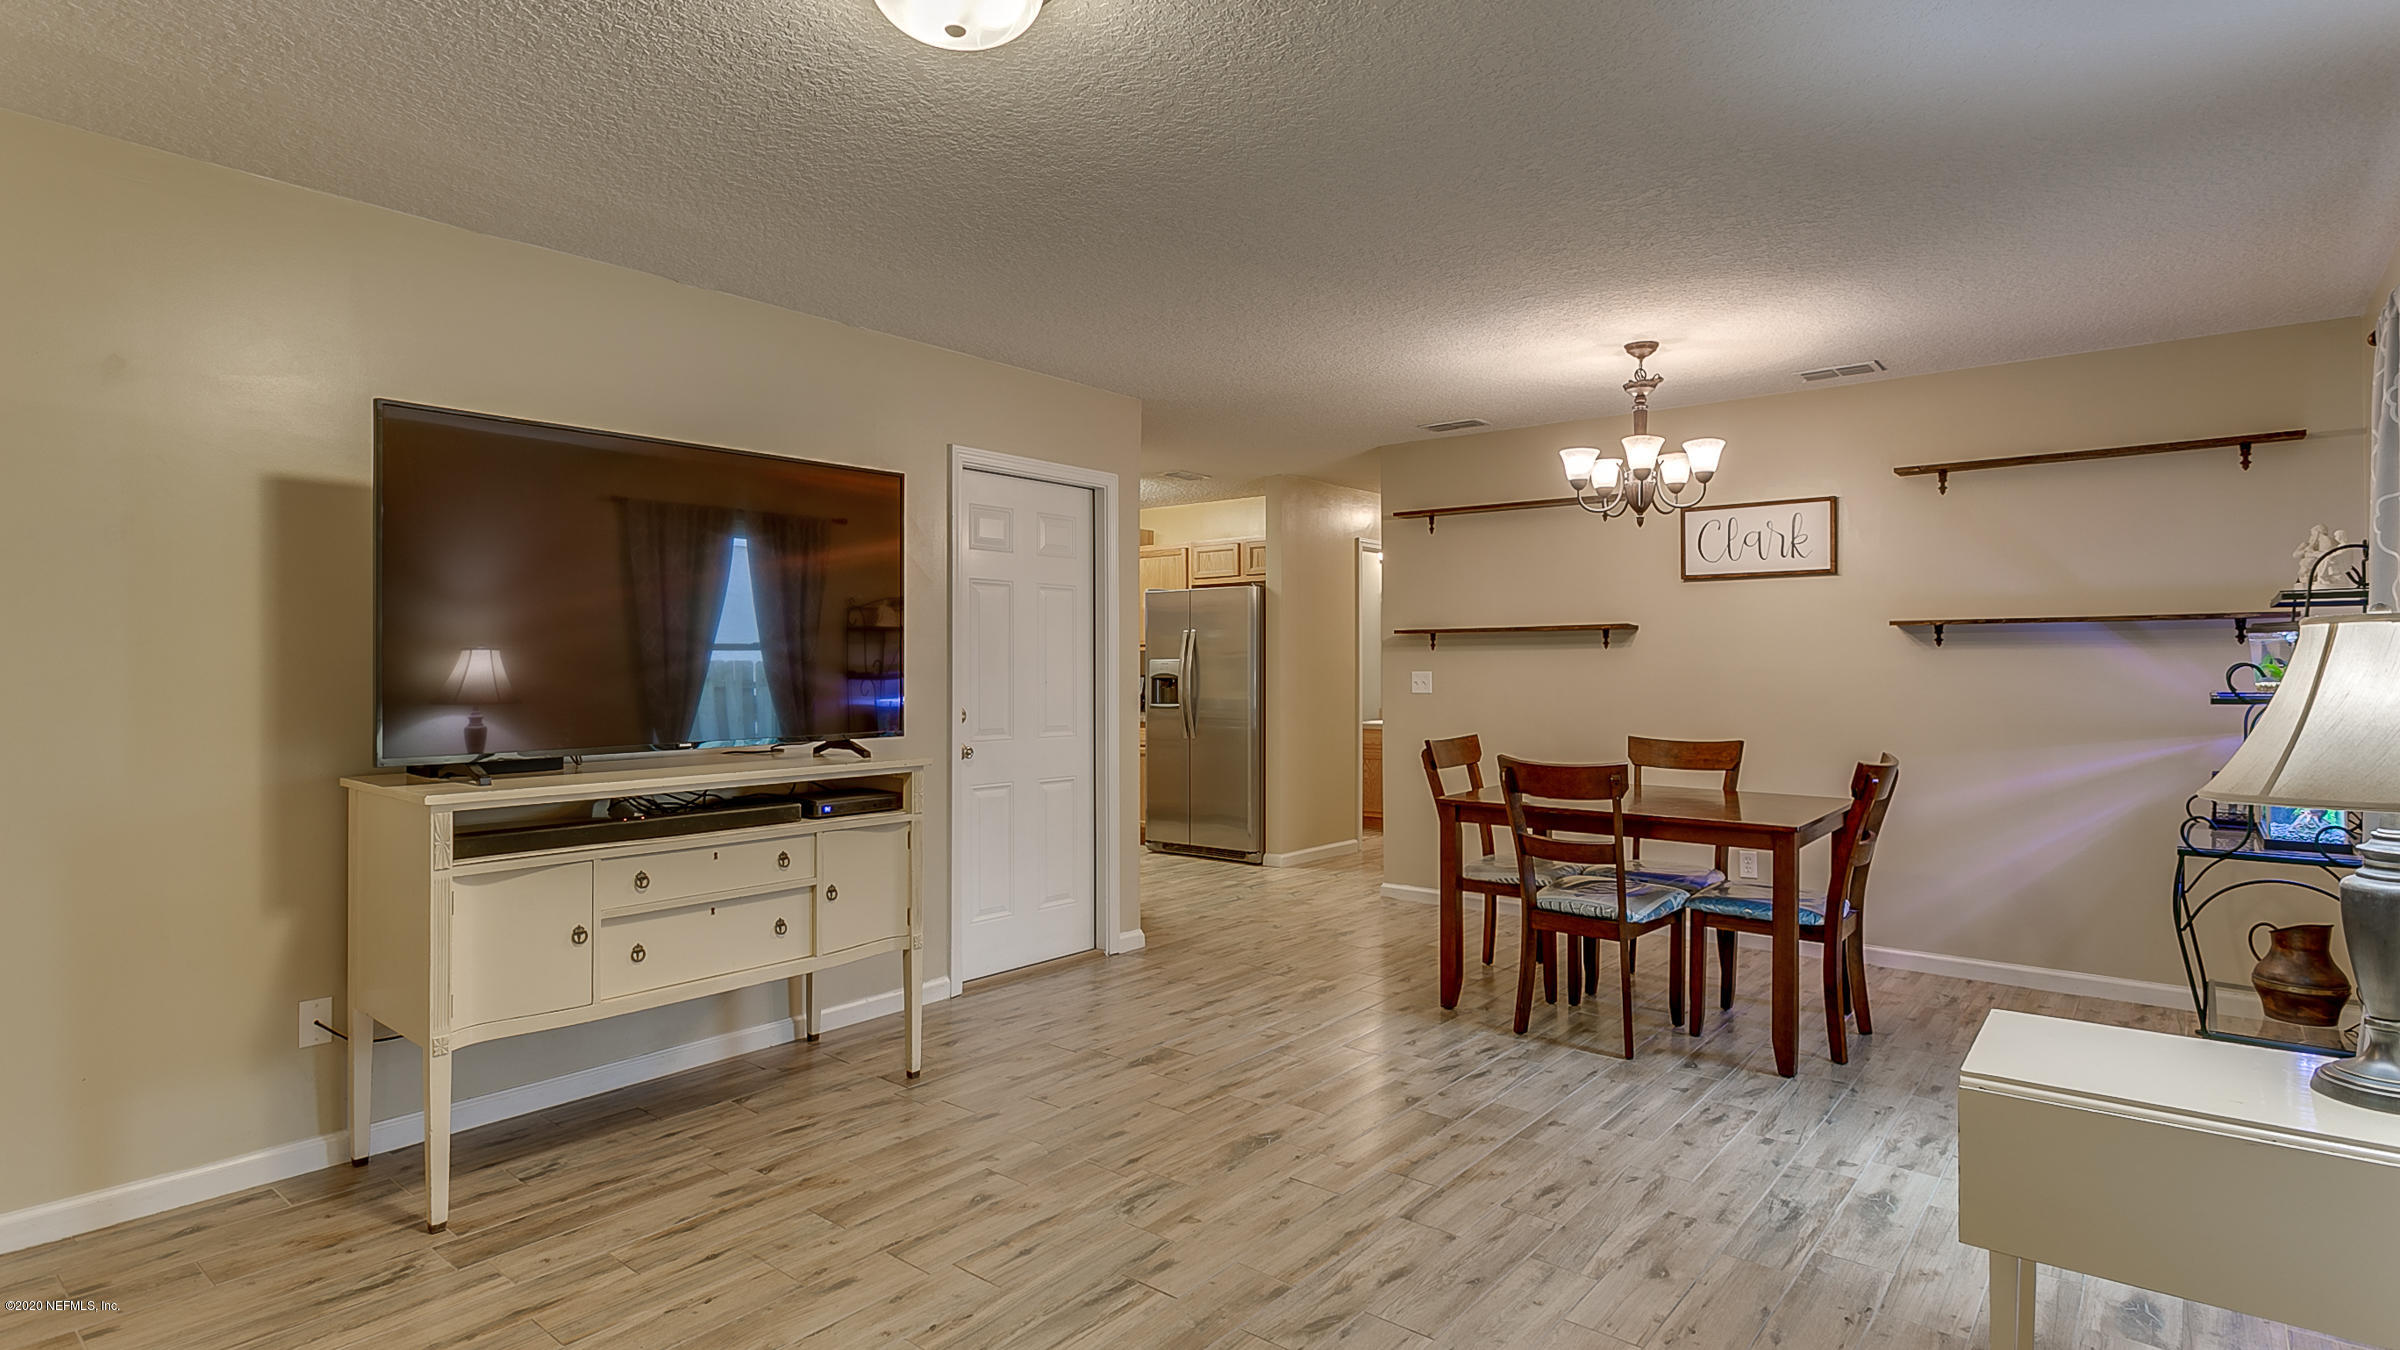 2053 KENNETH, JACKSONVILLE, FLORIDA 32207, 3 Bedrooms Bedrooms, ,2 BathroomsBathrooms,Residential,For sale,KENNETH,1082565